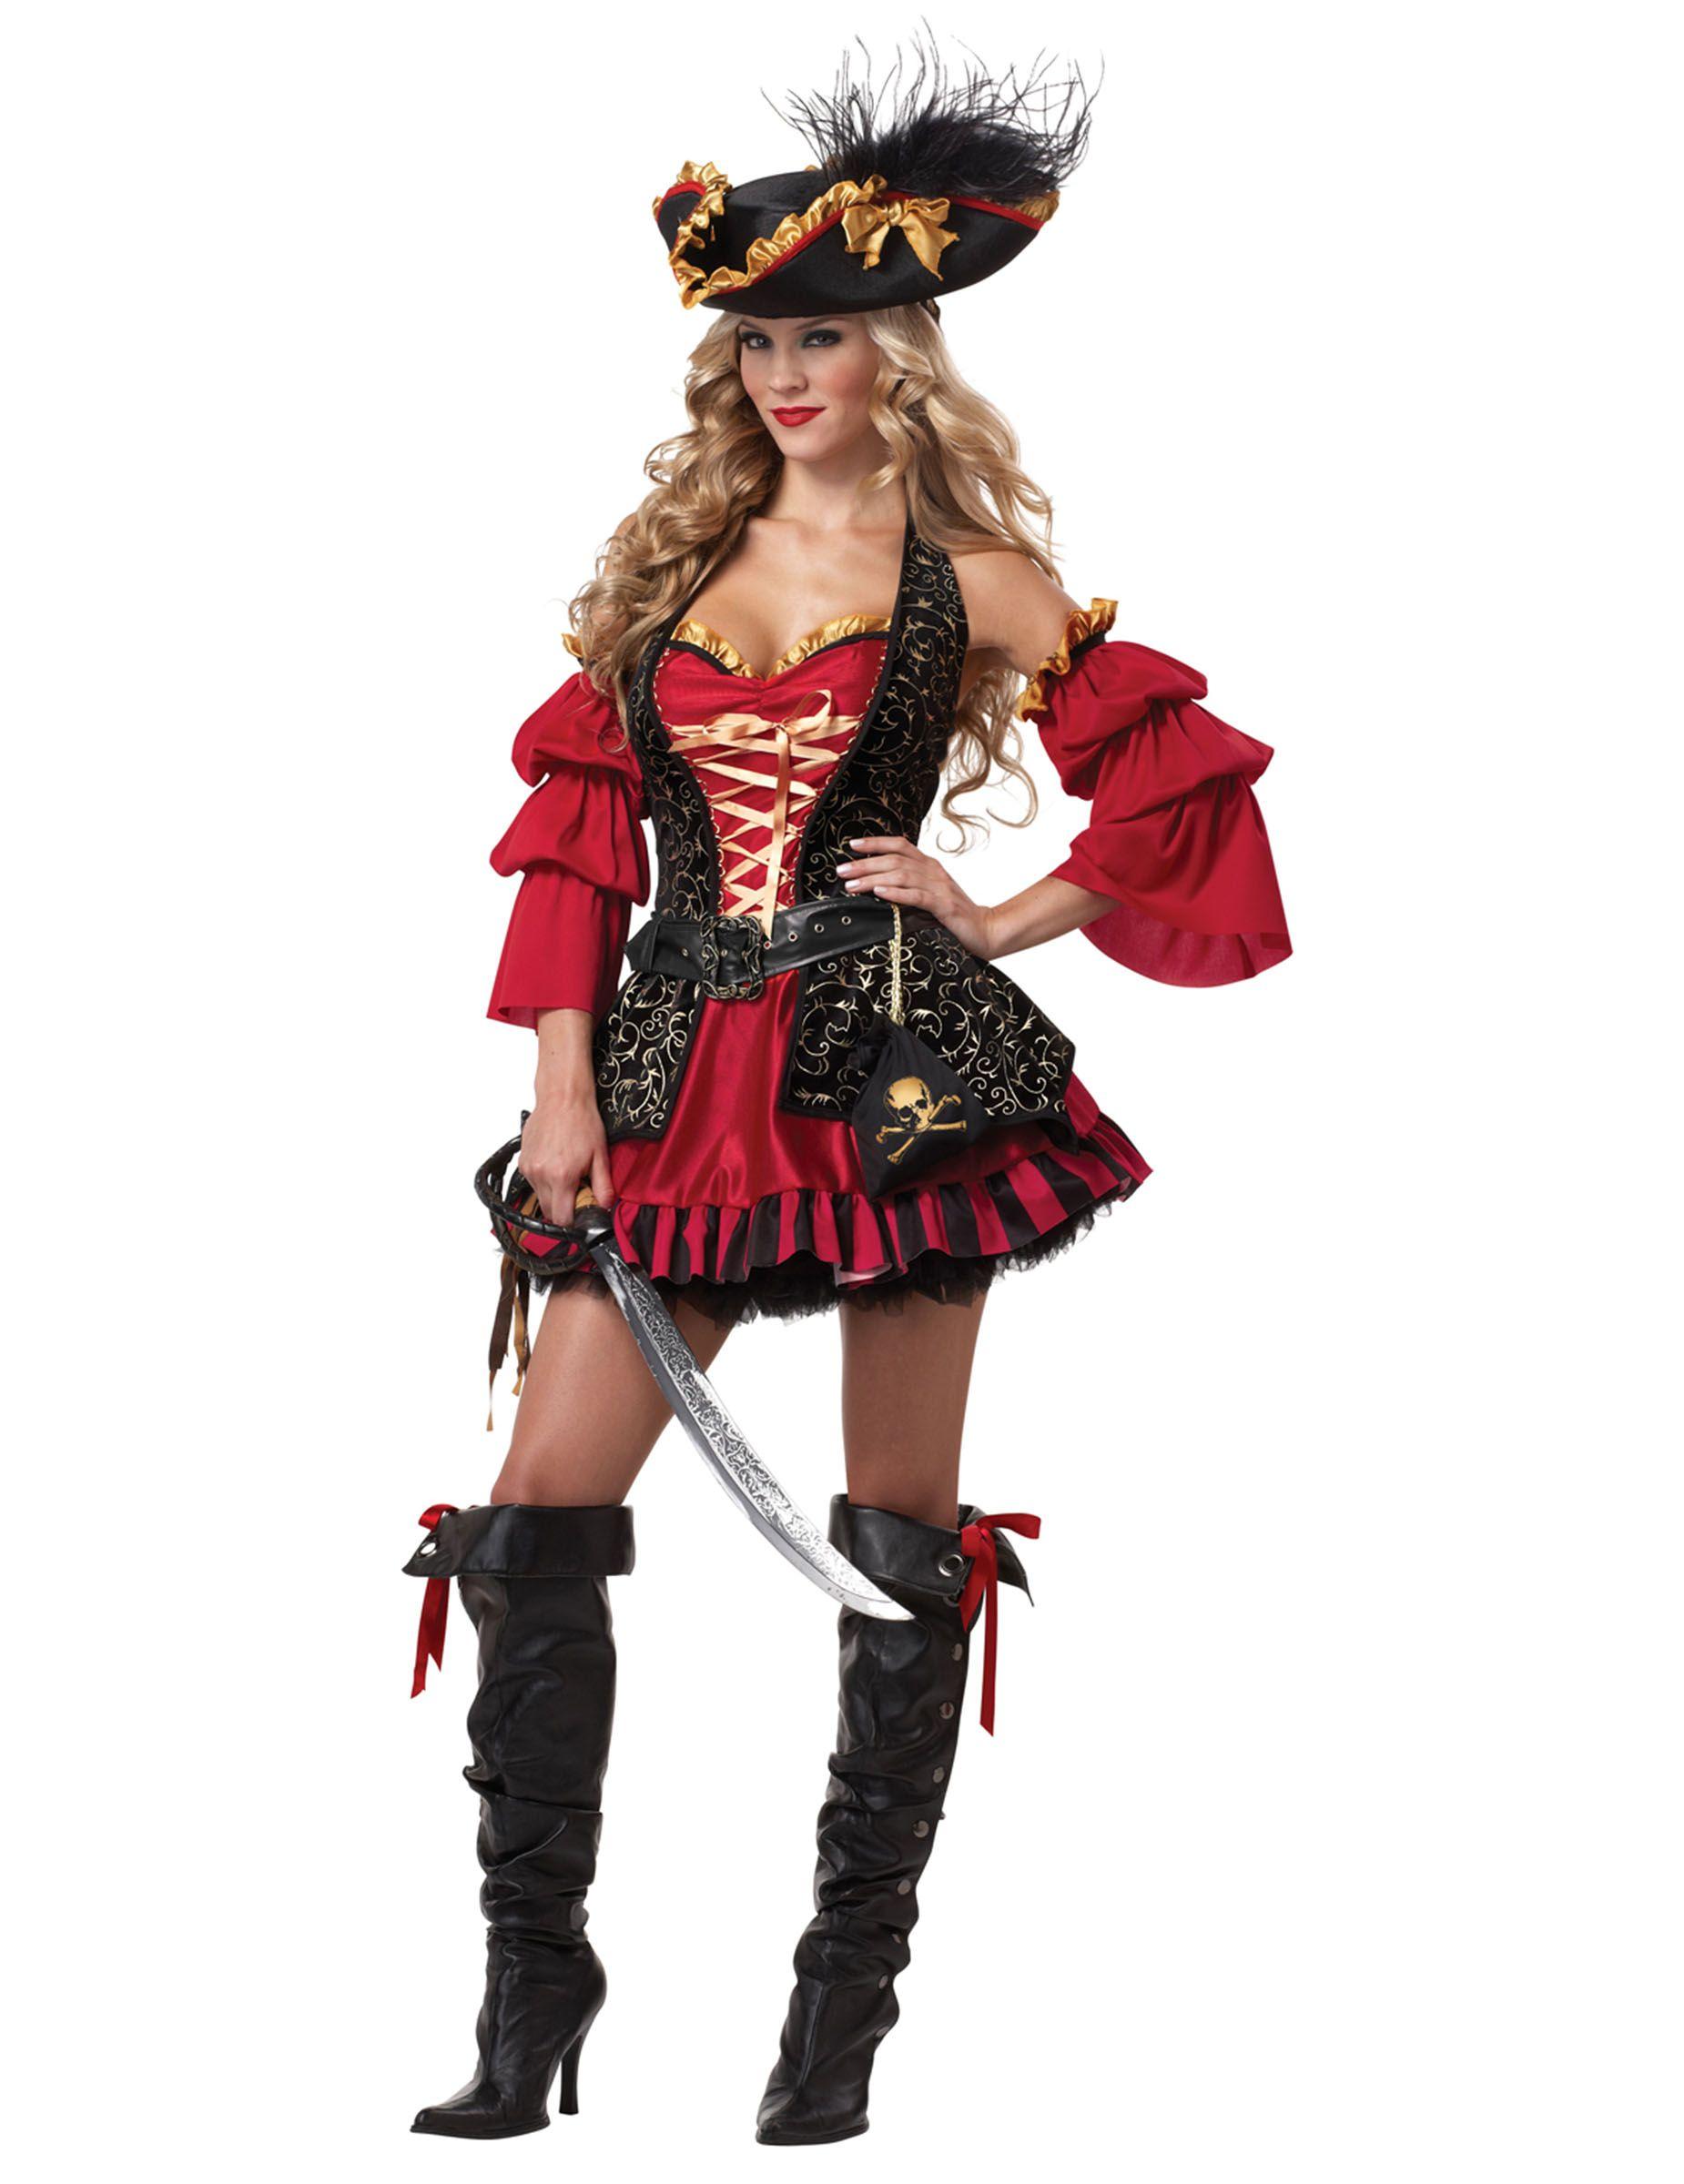 66d30385bb Disfraz Pirata rojo para mujer -Premium  Este disfraz de Pirata para mujer  incluye vestido